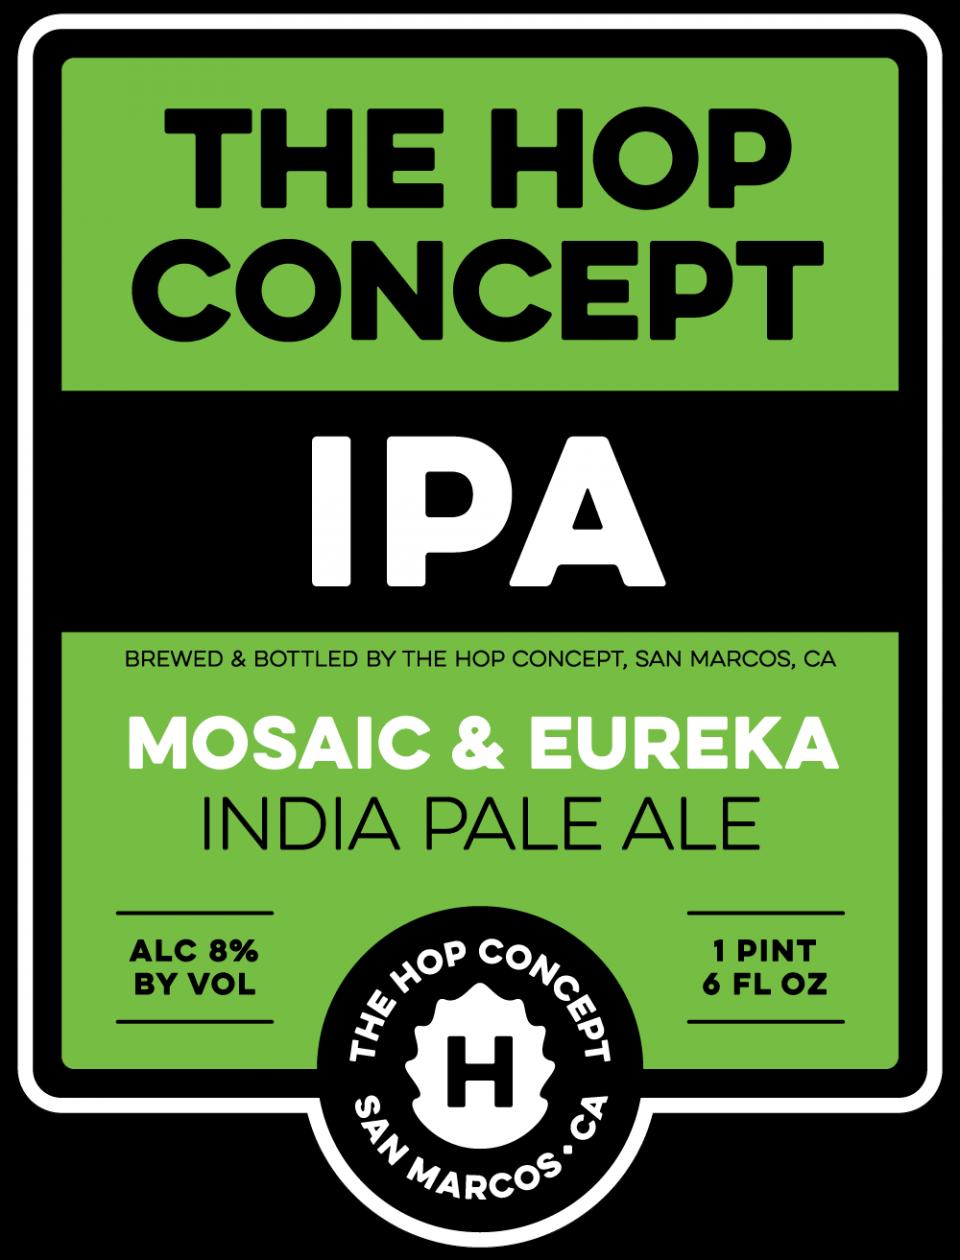 The Hop Concept Mosaic and Eureka